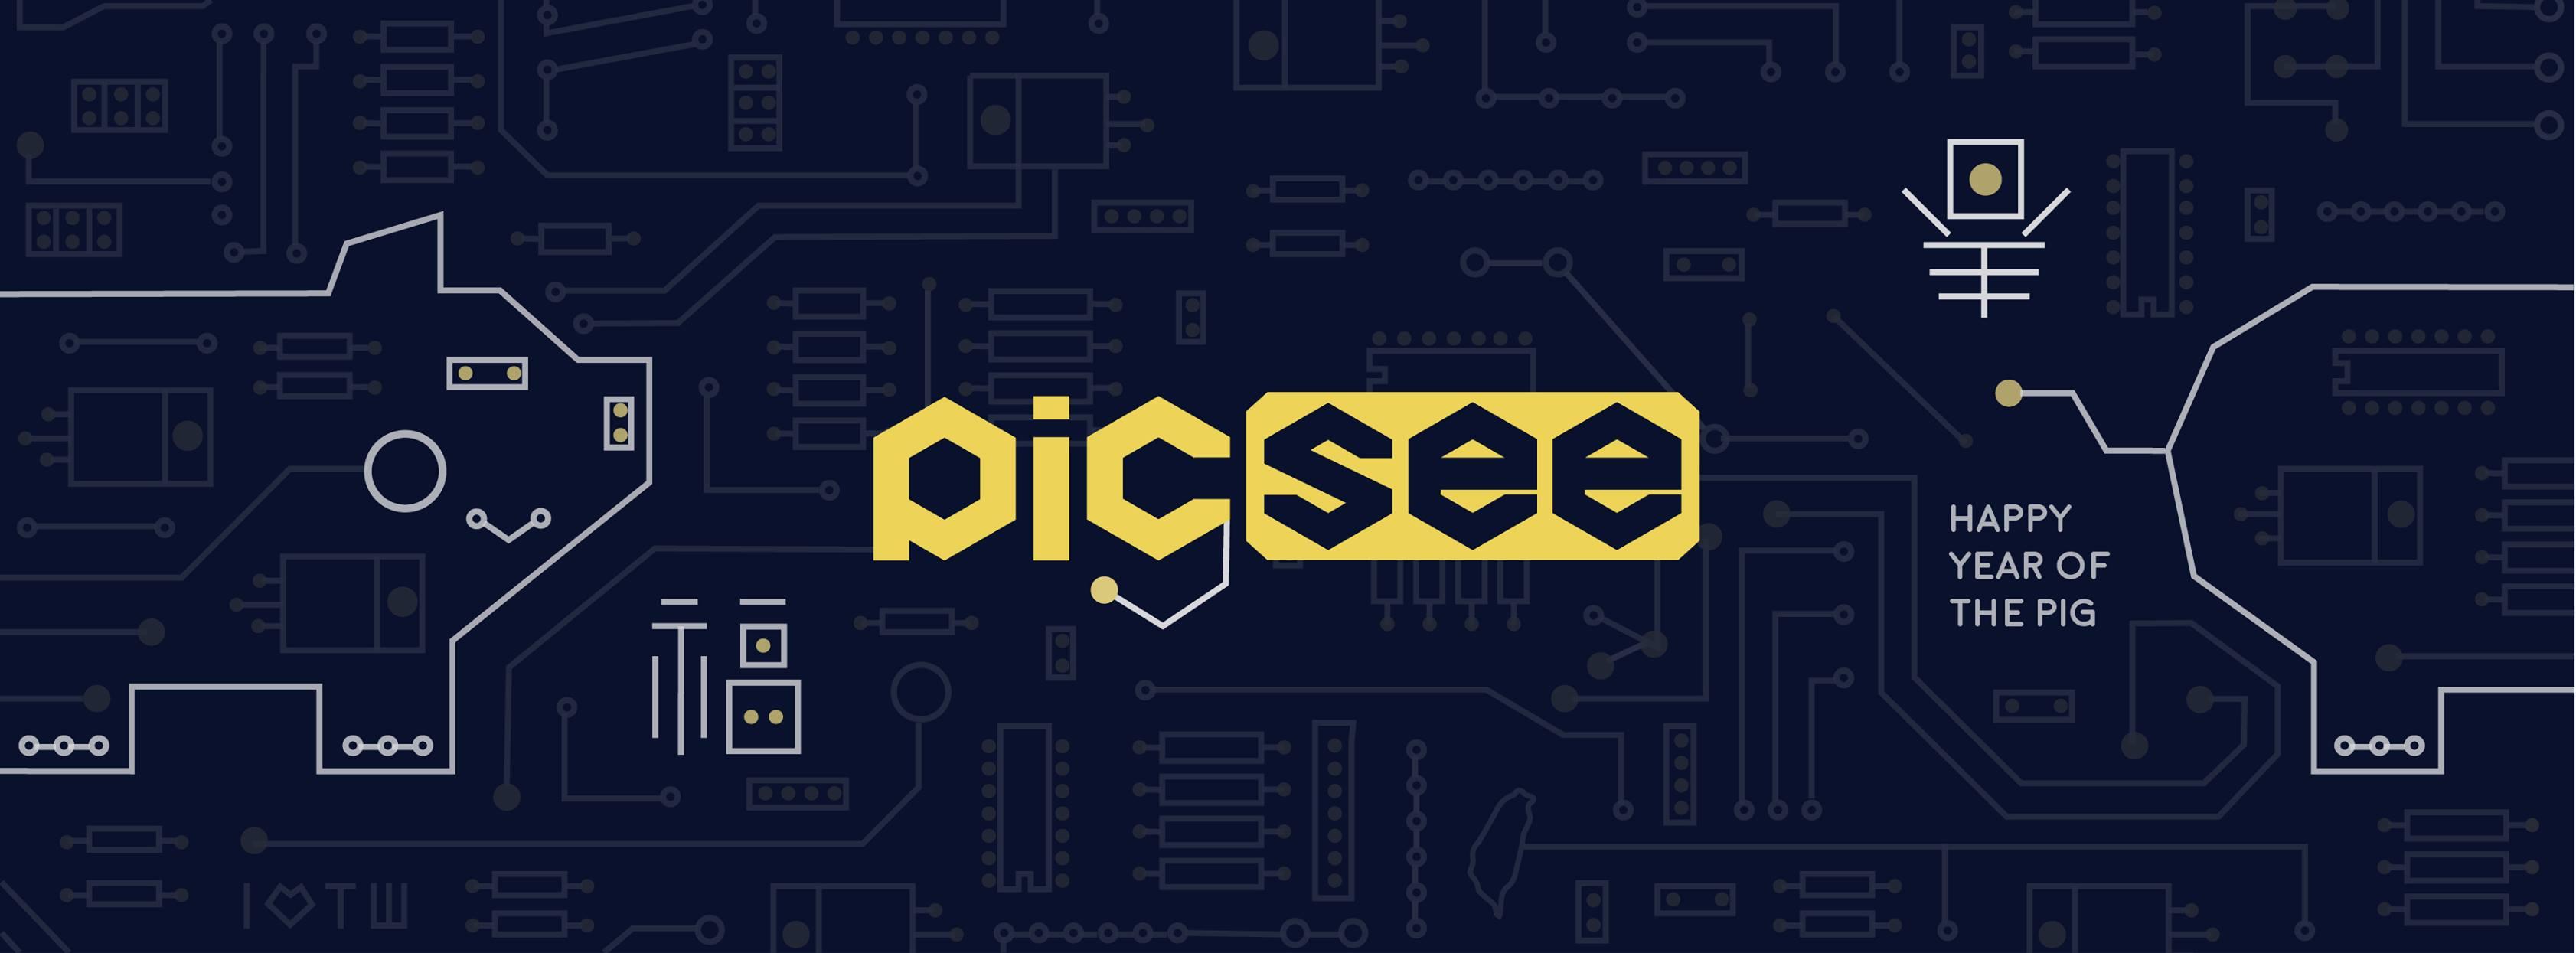 縮短網址 | PicSee 行銷.優化.追蹤